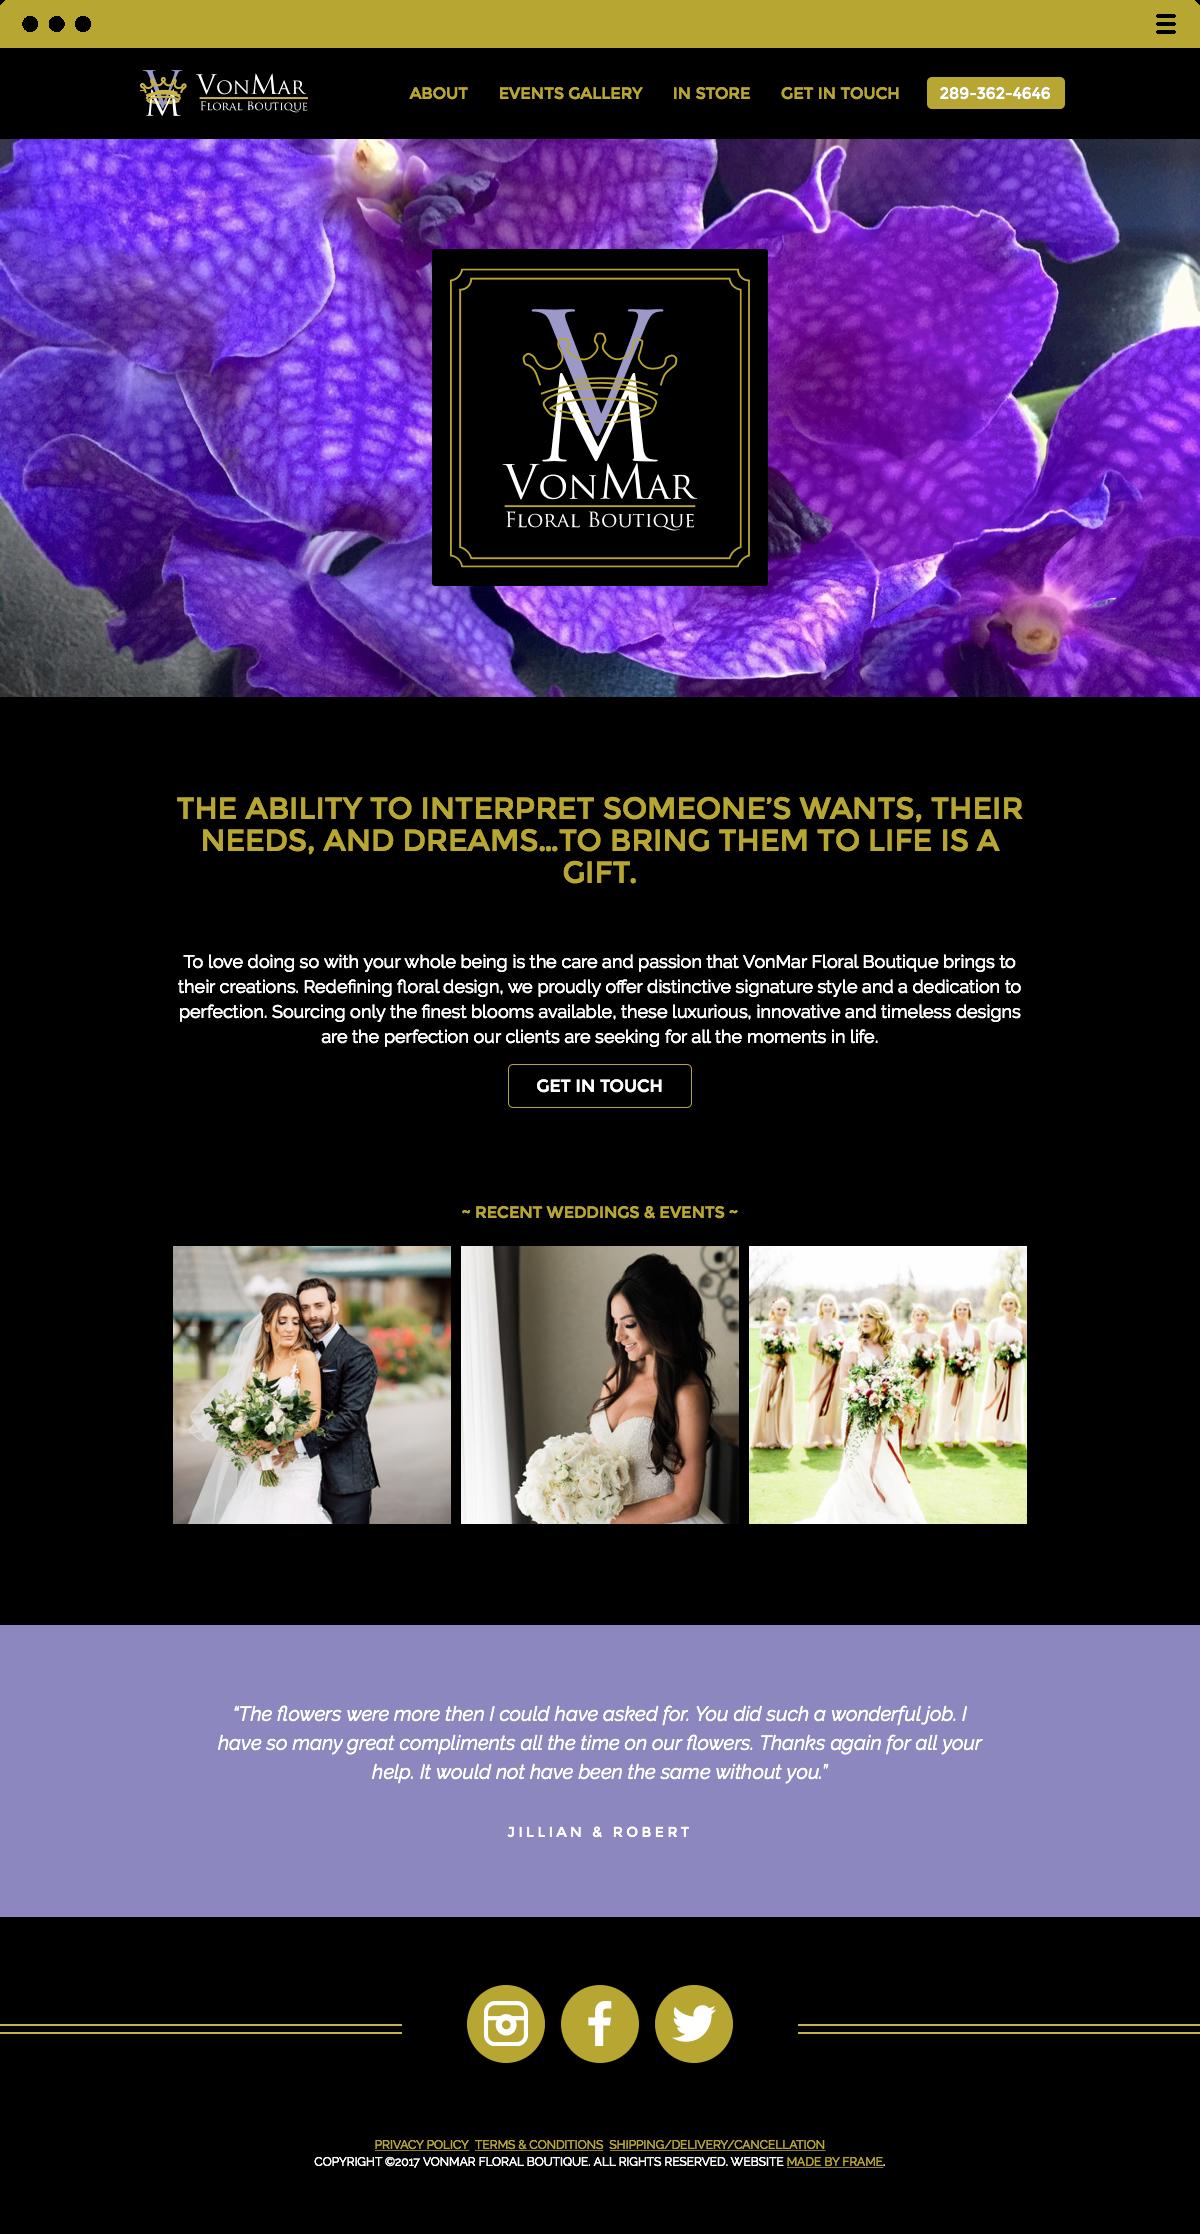 VonMar Floral Boutique Website Made by Frame